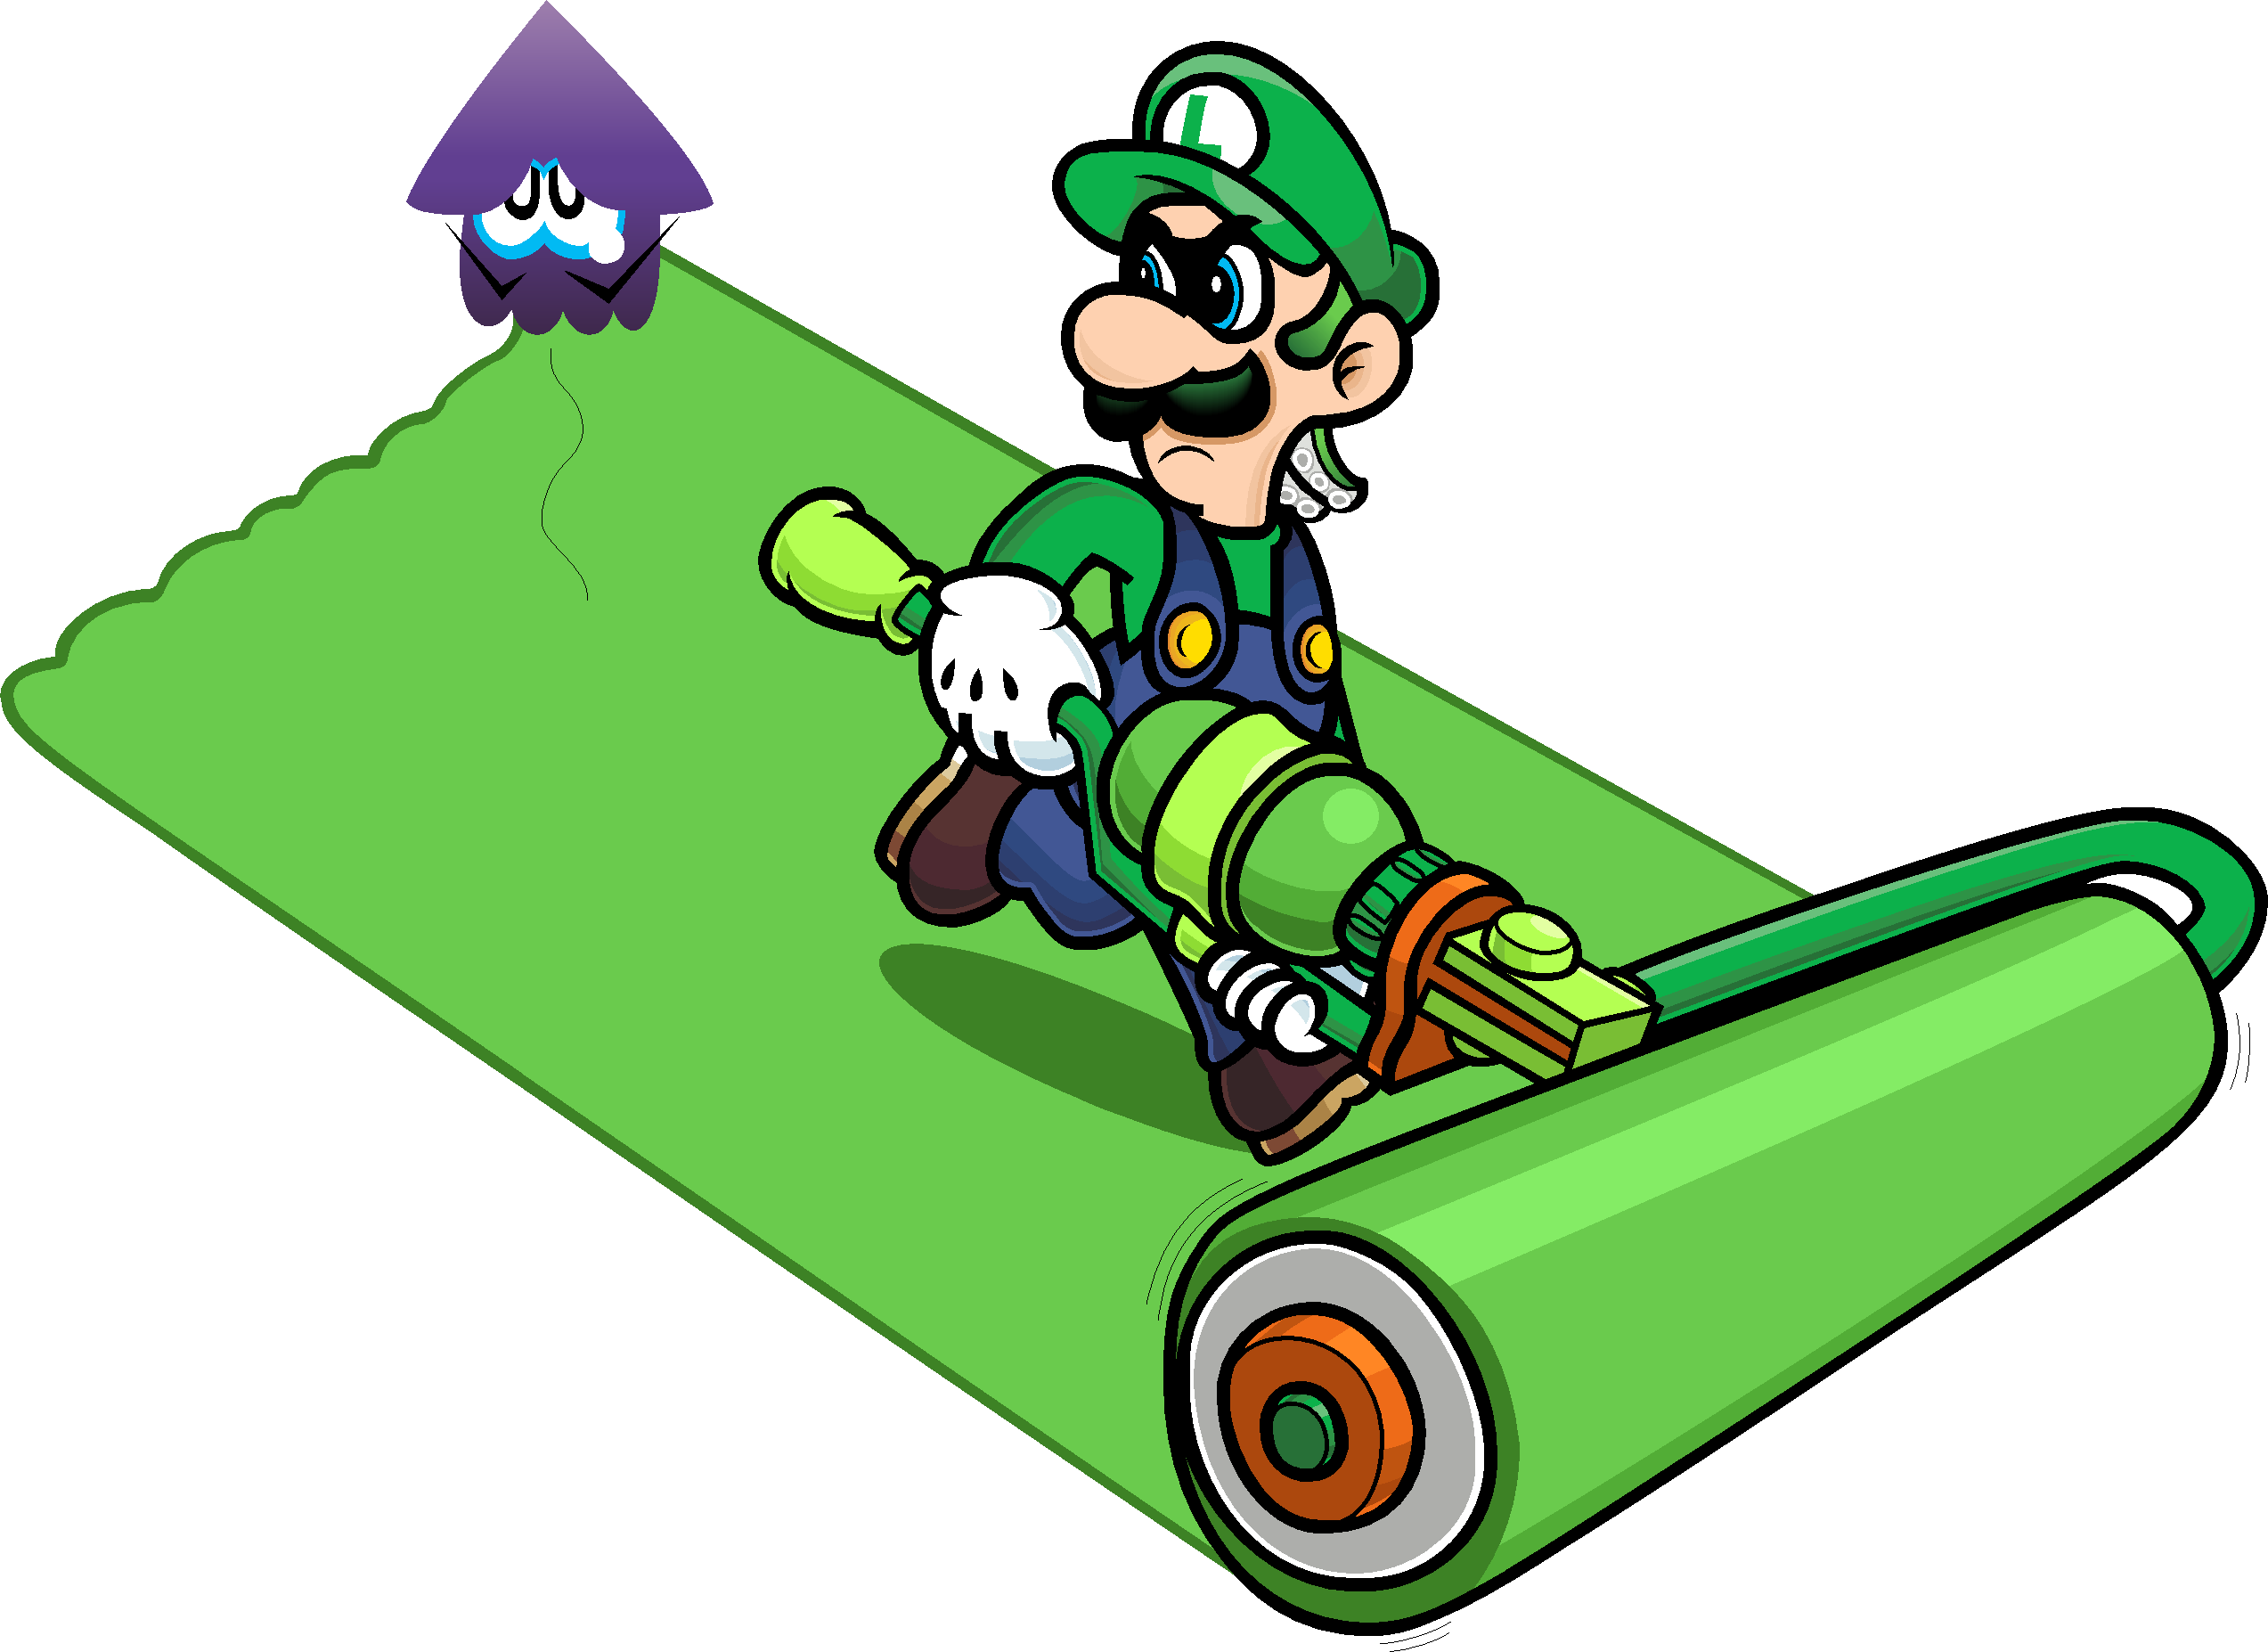 Mario Mario Luigi Green Clip Art Product Luigi Death Stare